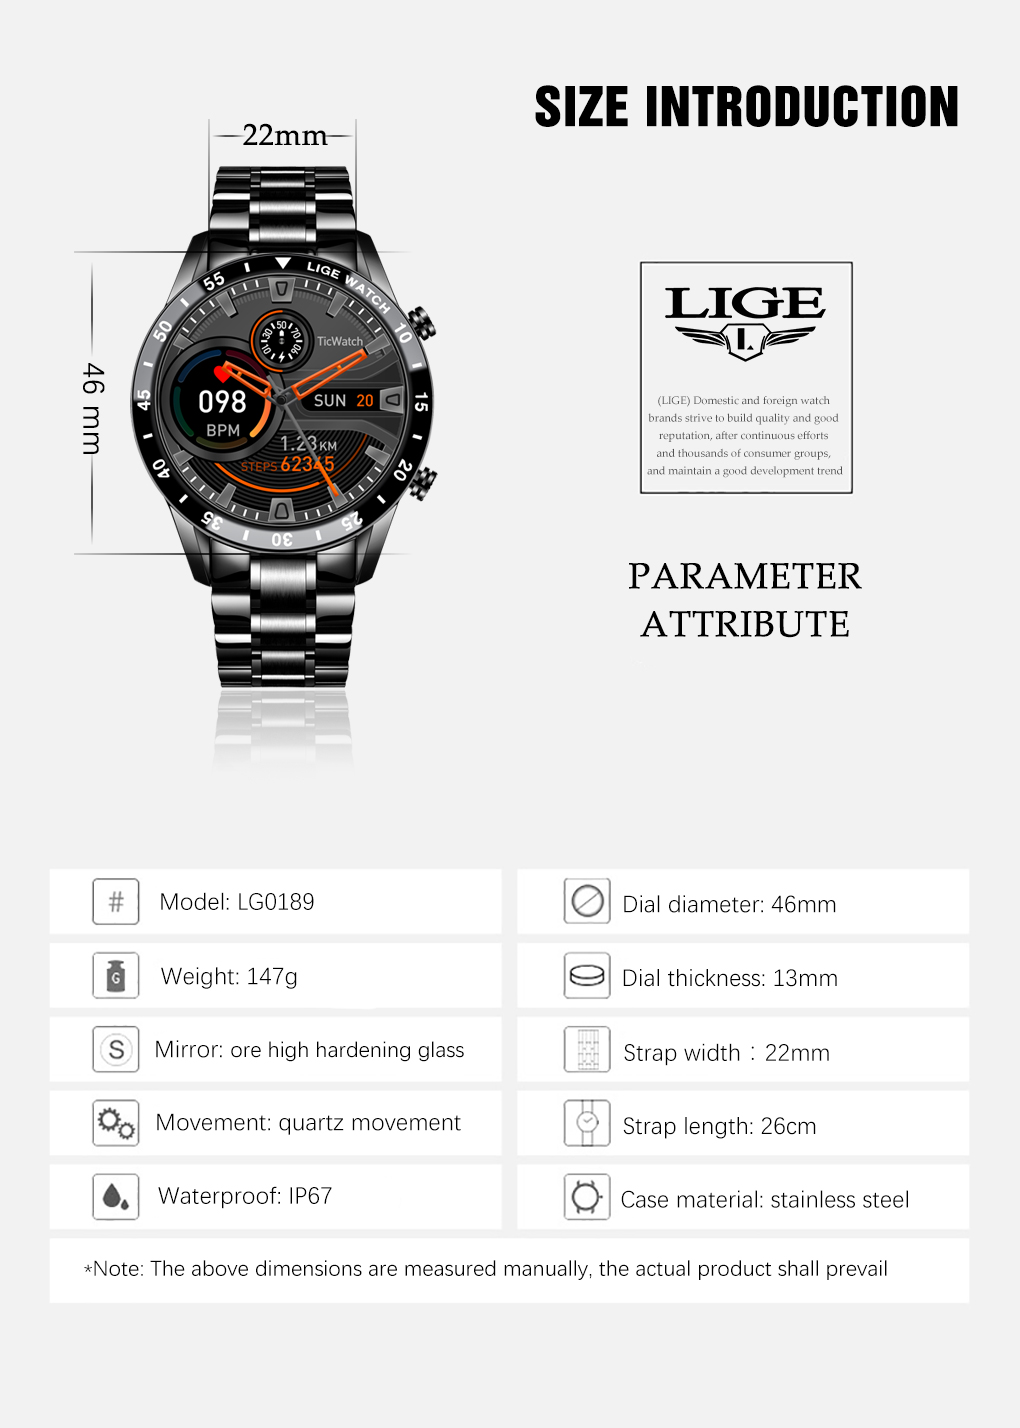 H51430b6998604454982061262869f77am LIGE 2021 Full circle touch screen steel Band luxury Bluetooth call Men smart watch Waterproof Sport Activity fitness watch+box